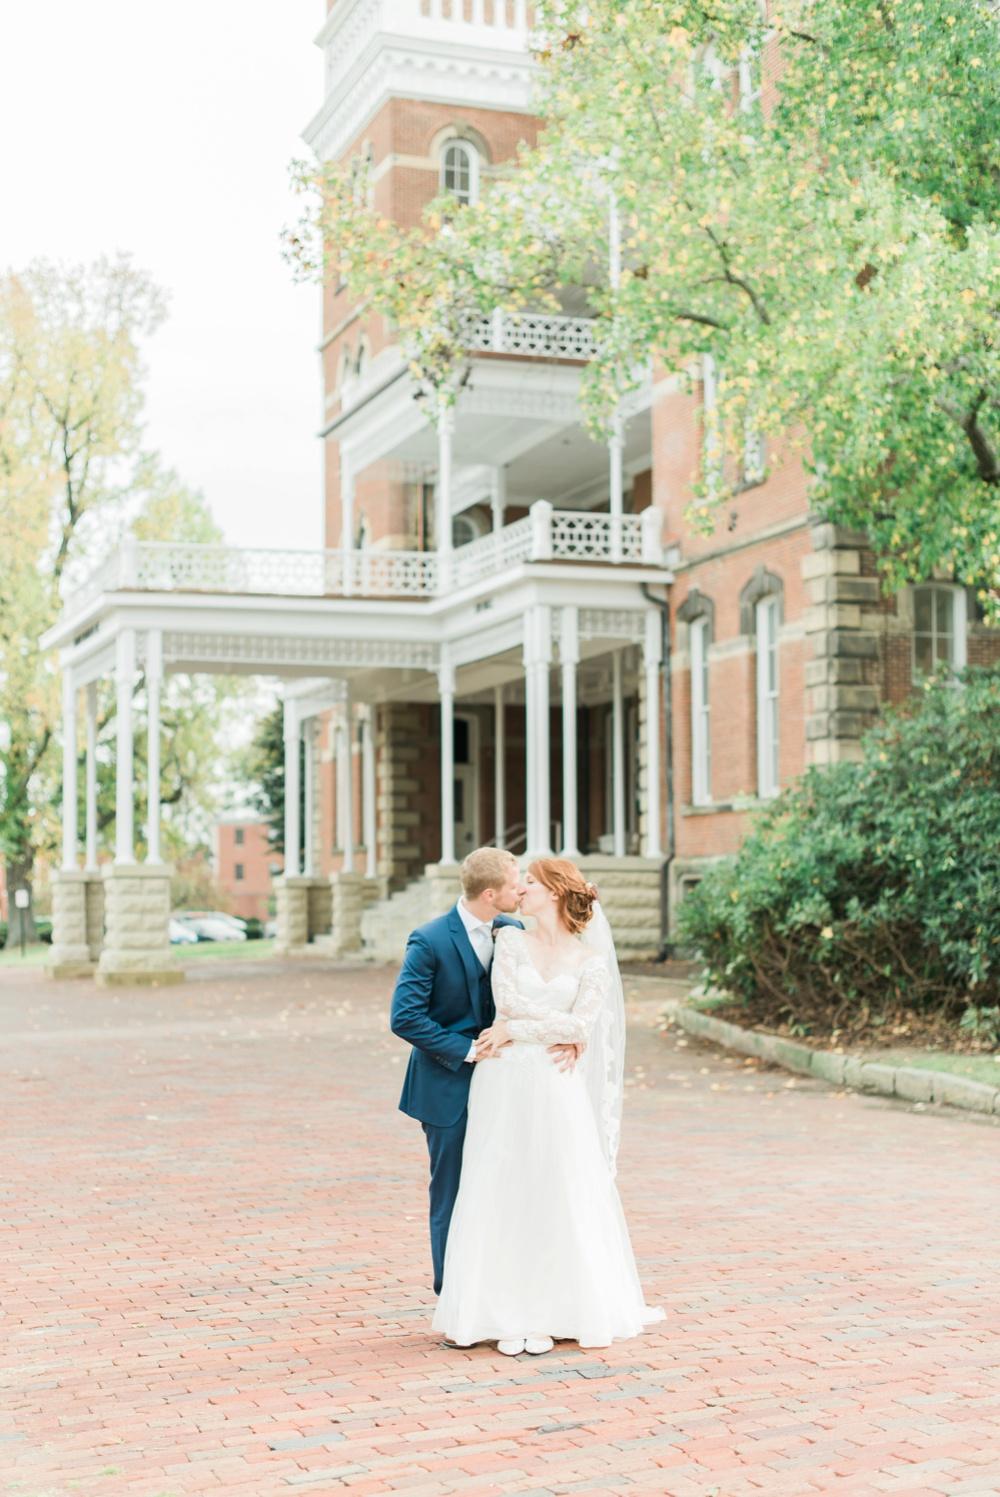 ohio-university-walter-hall-wedding-athens-anna-mark_0052.jpg